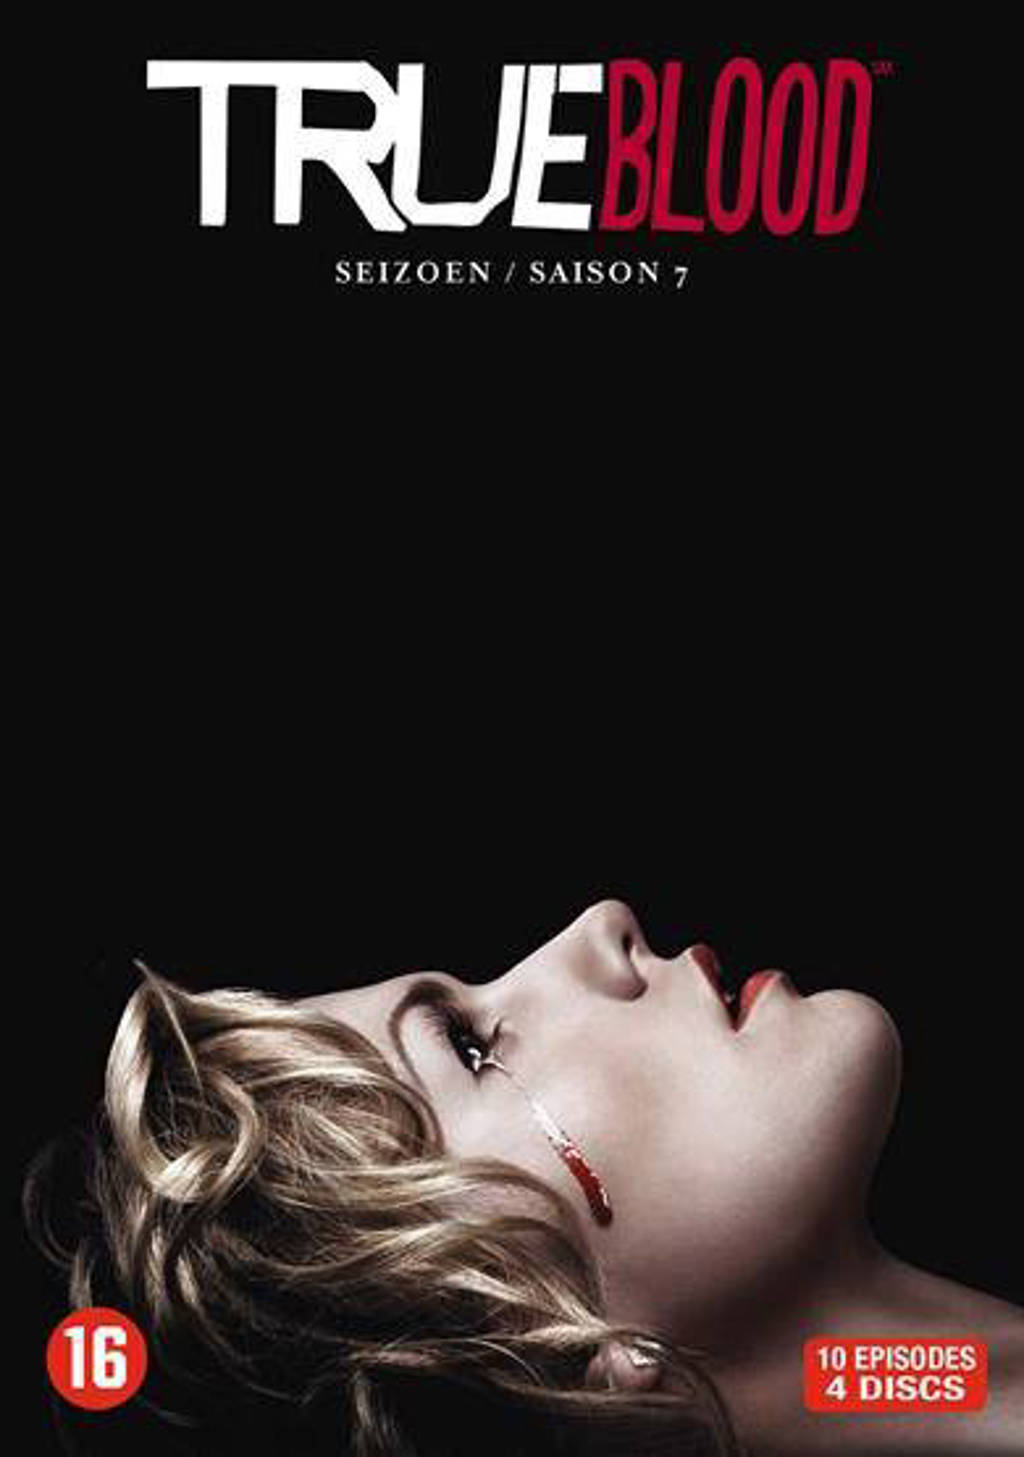 True blood - Seizoen 7 (DVD)